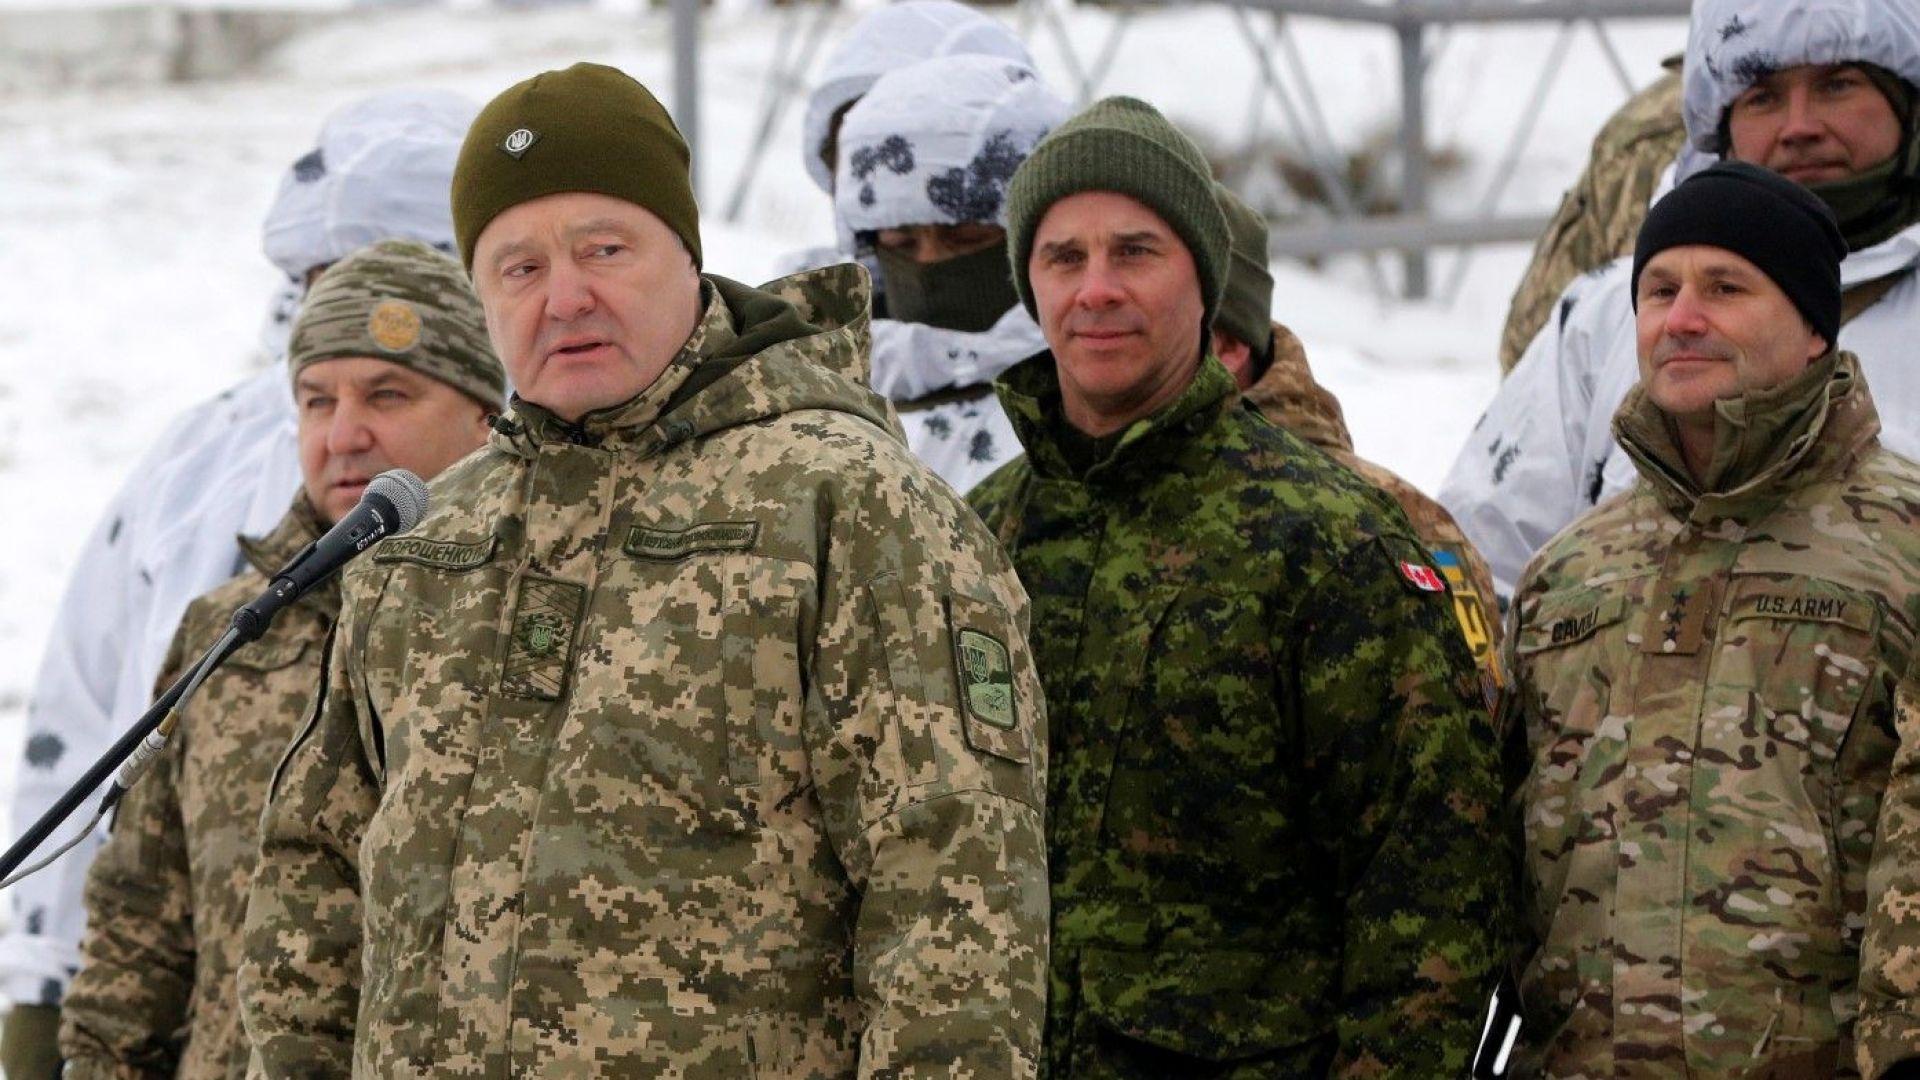 Русия е отворила Керченския пролив, обяви Киев